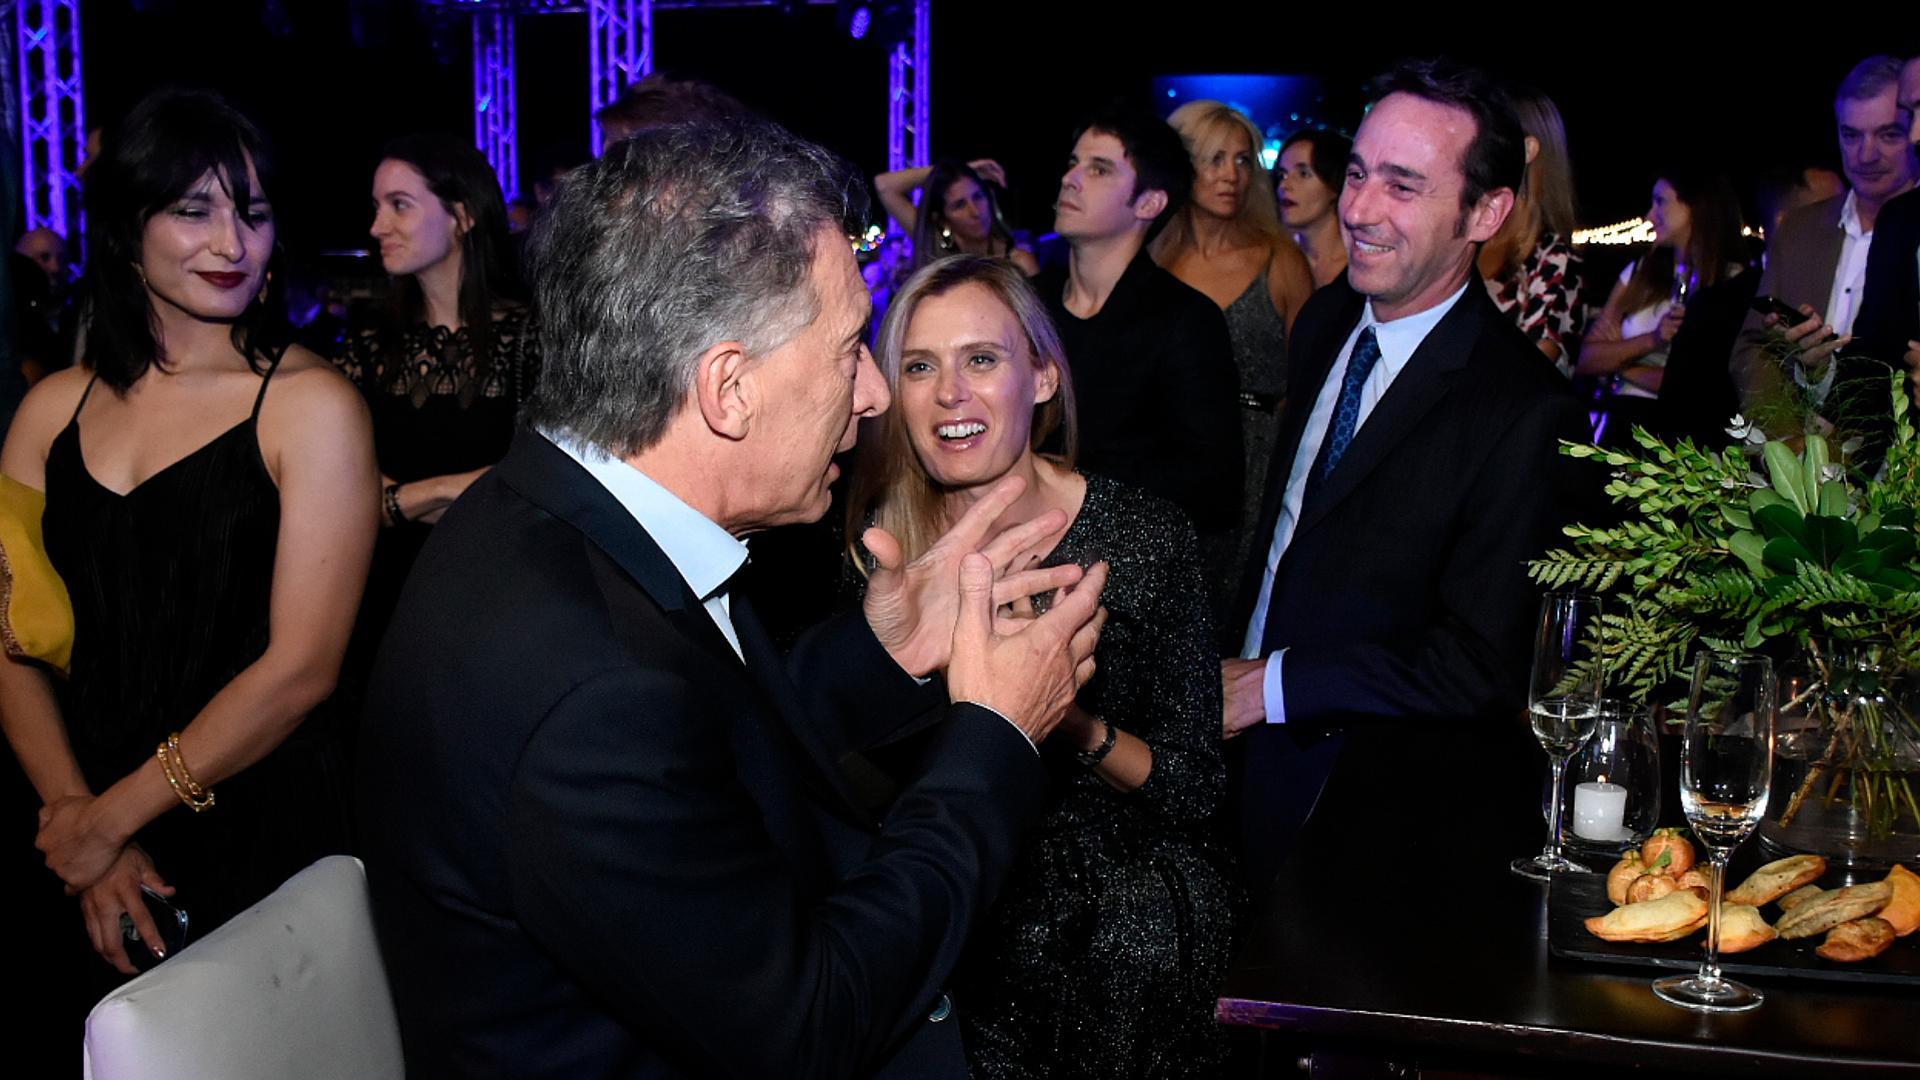 Macri saludando a Marcos Galperín